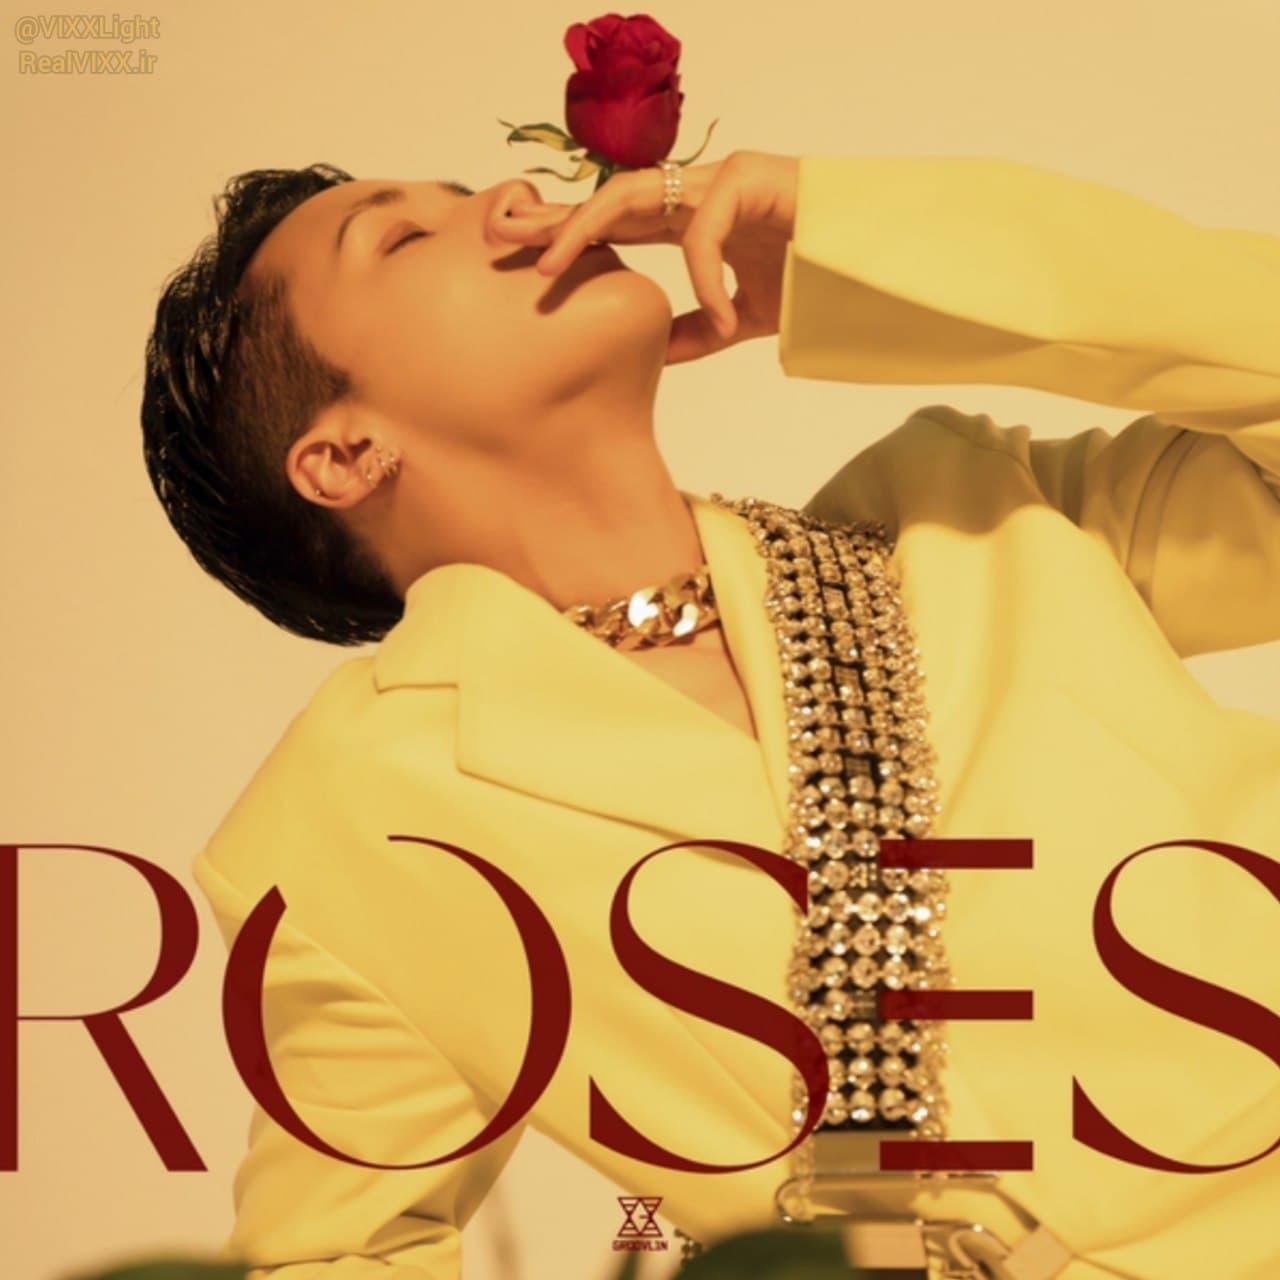 Ravi Roses